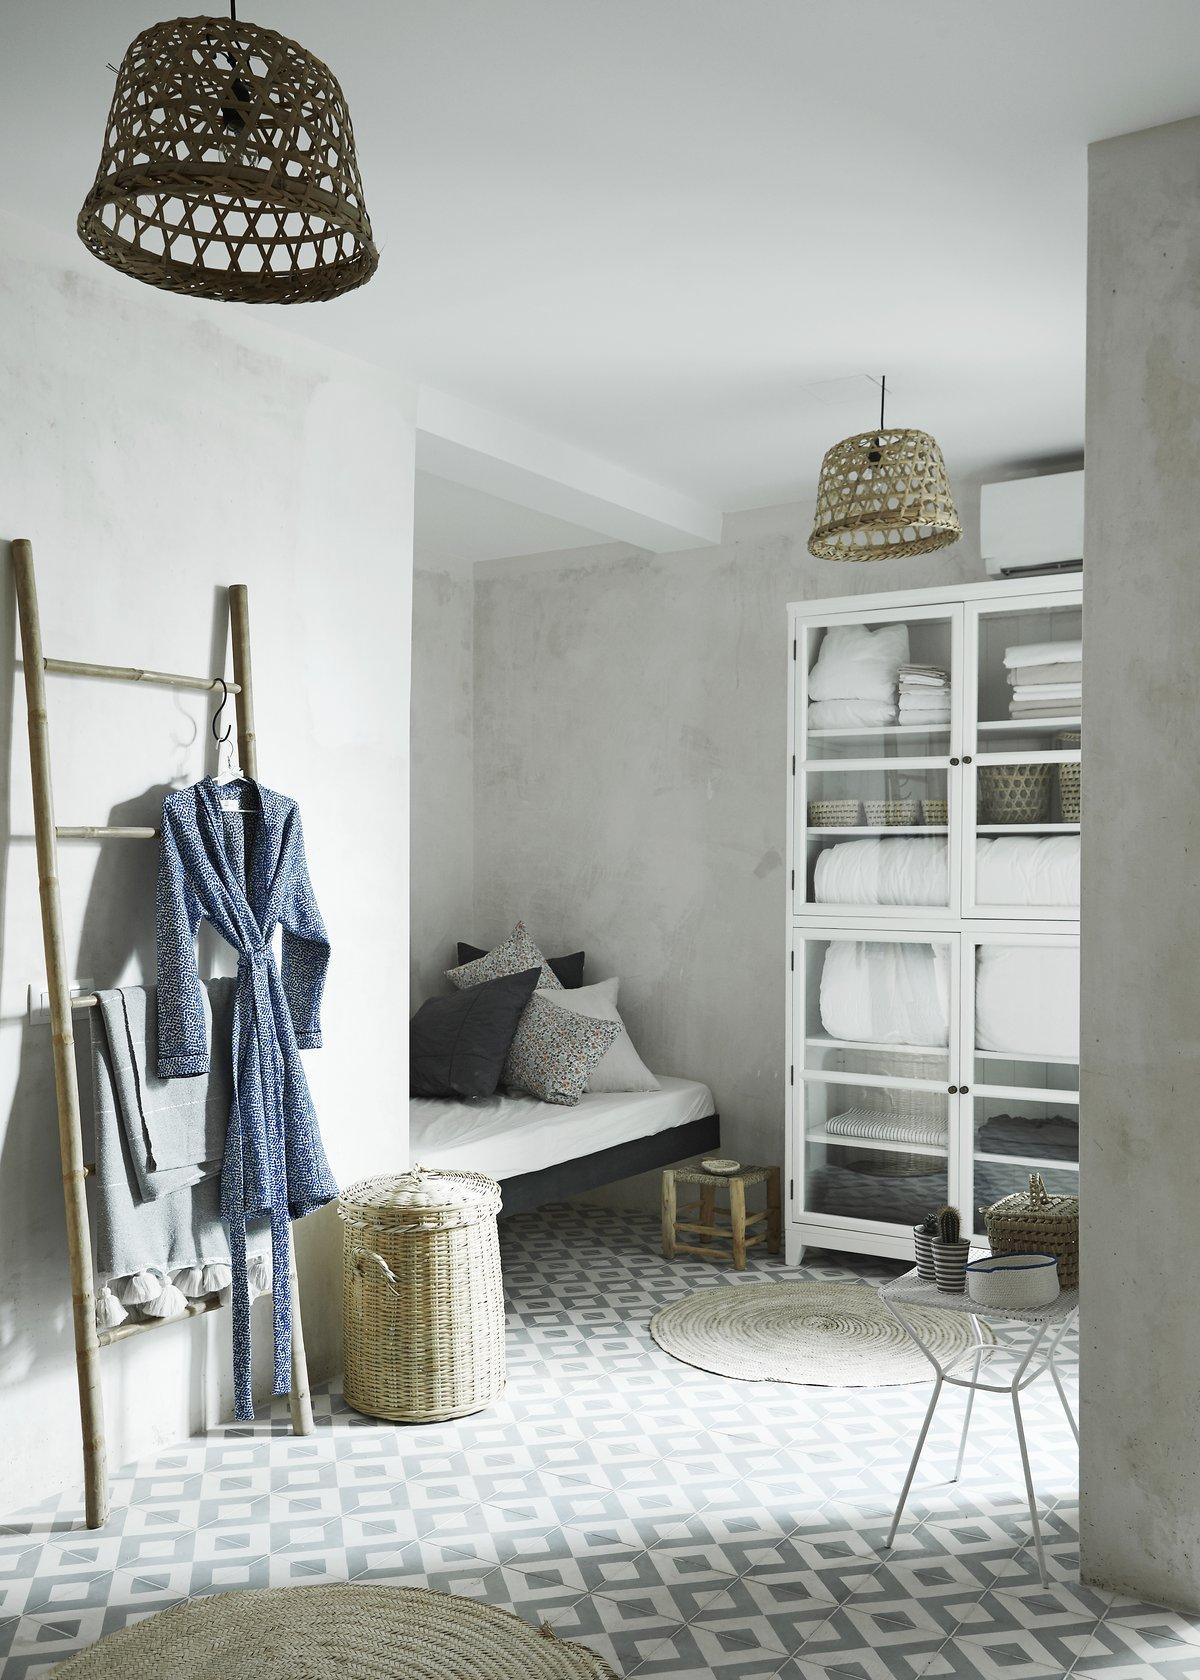 about tinekhome tine k home. Black Bedroom Furniture Sets. Home Design Ideas